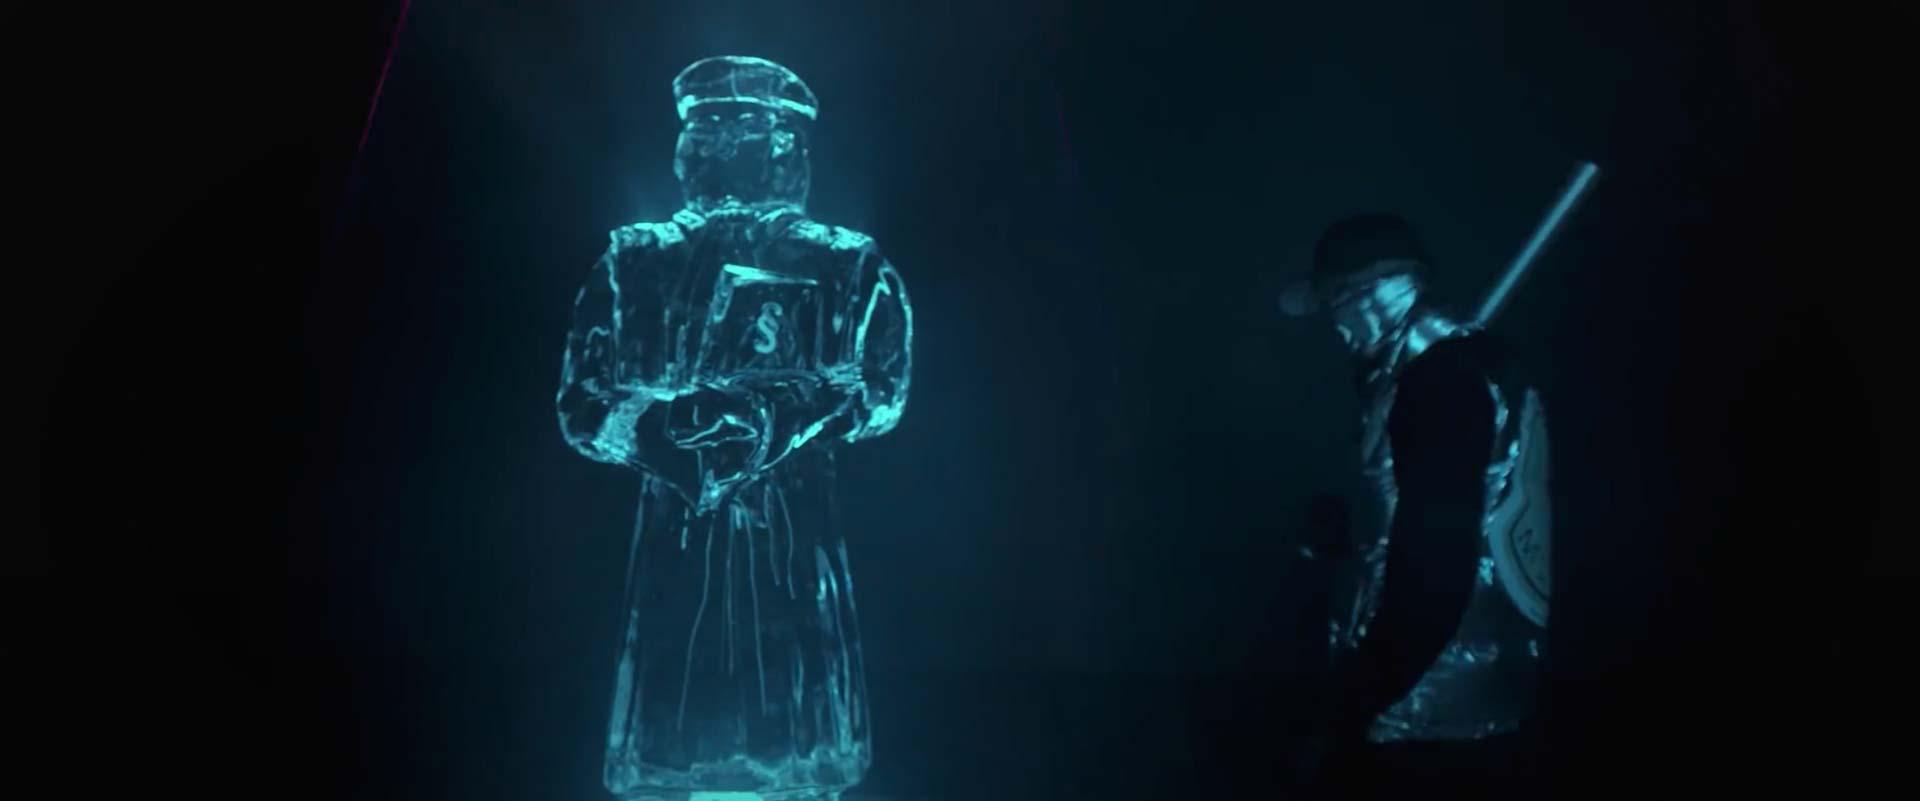 Musikvideo Screenshot AK Ausserkontrolle Kristall 2